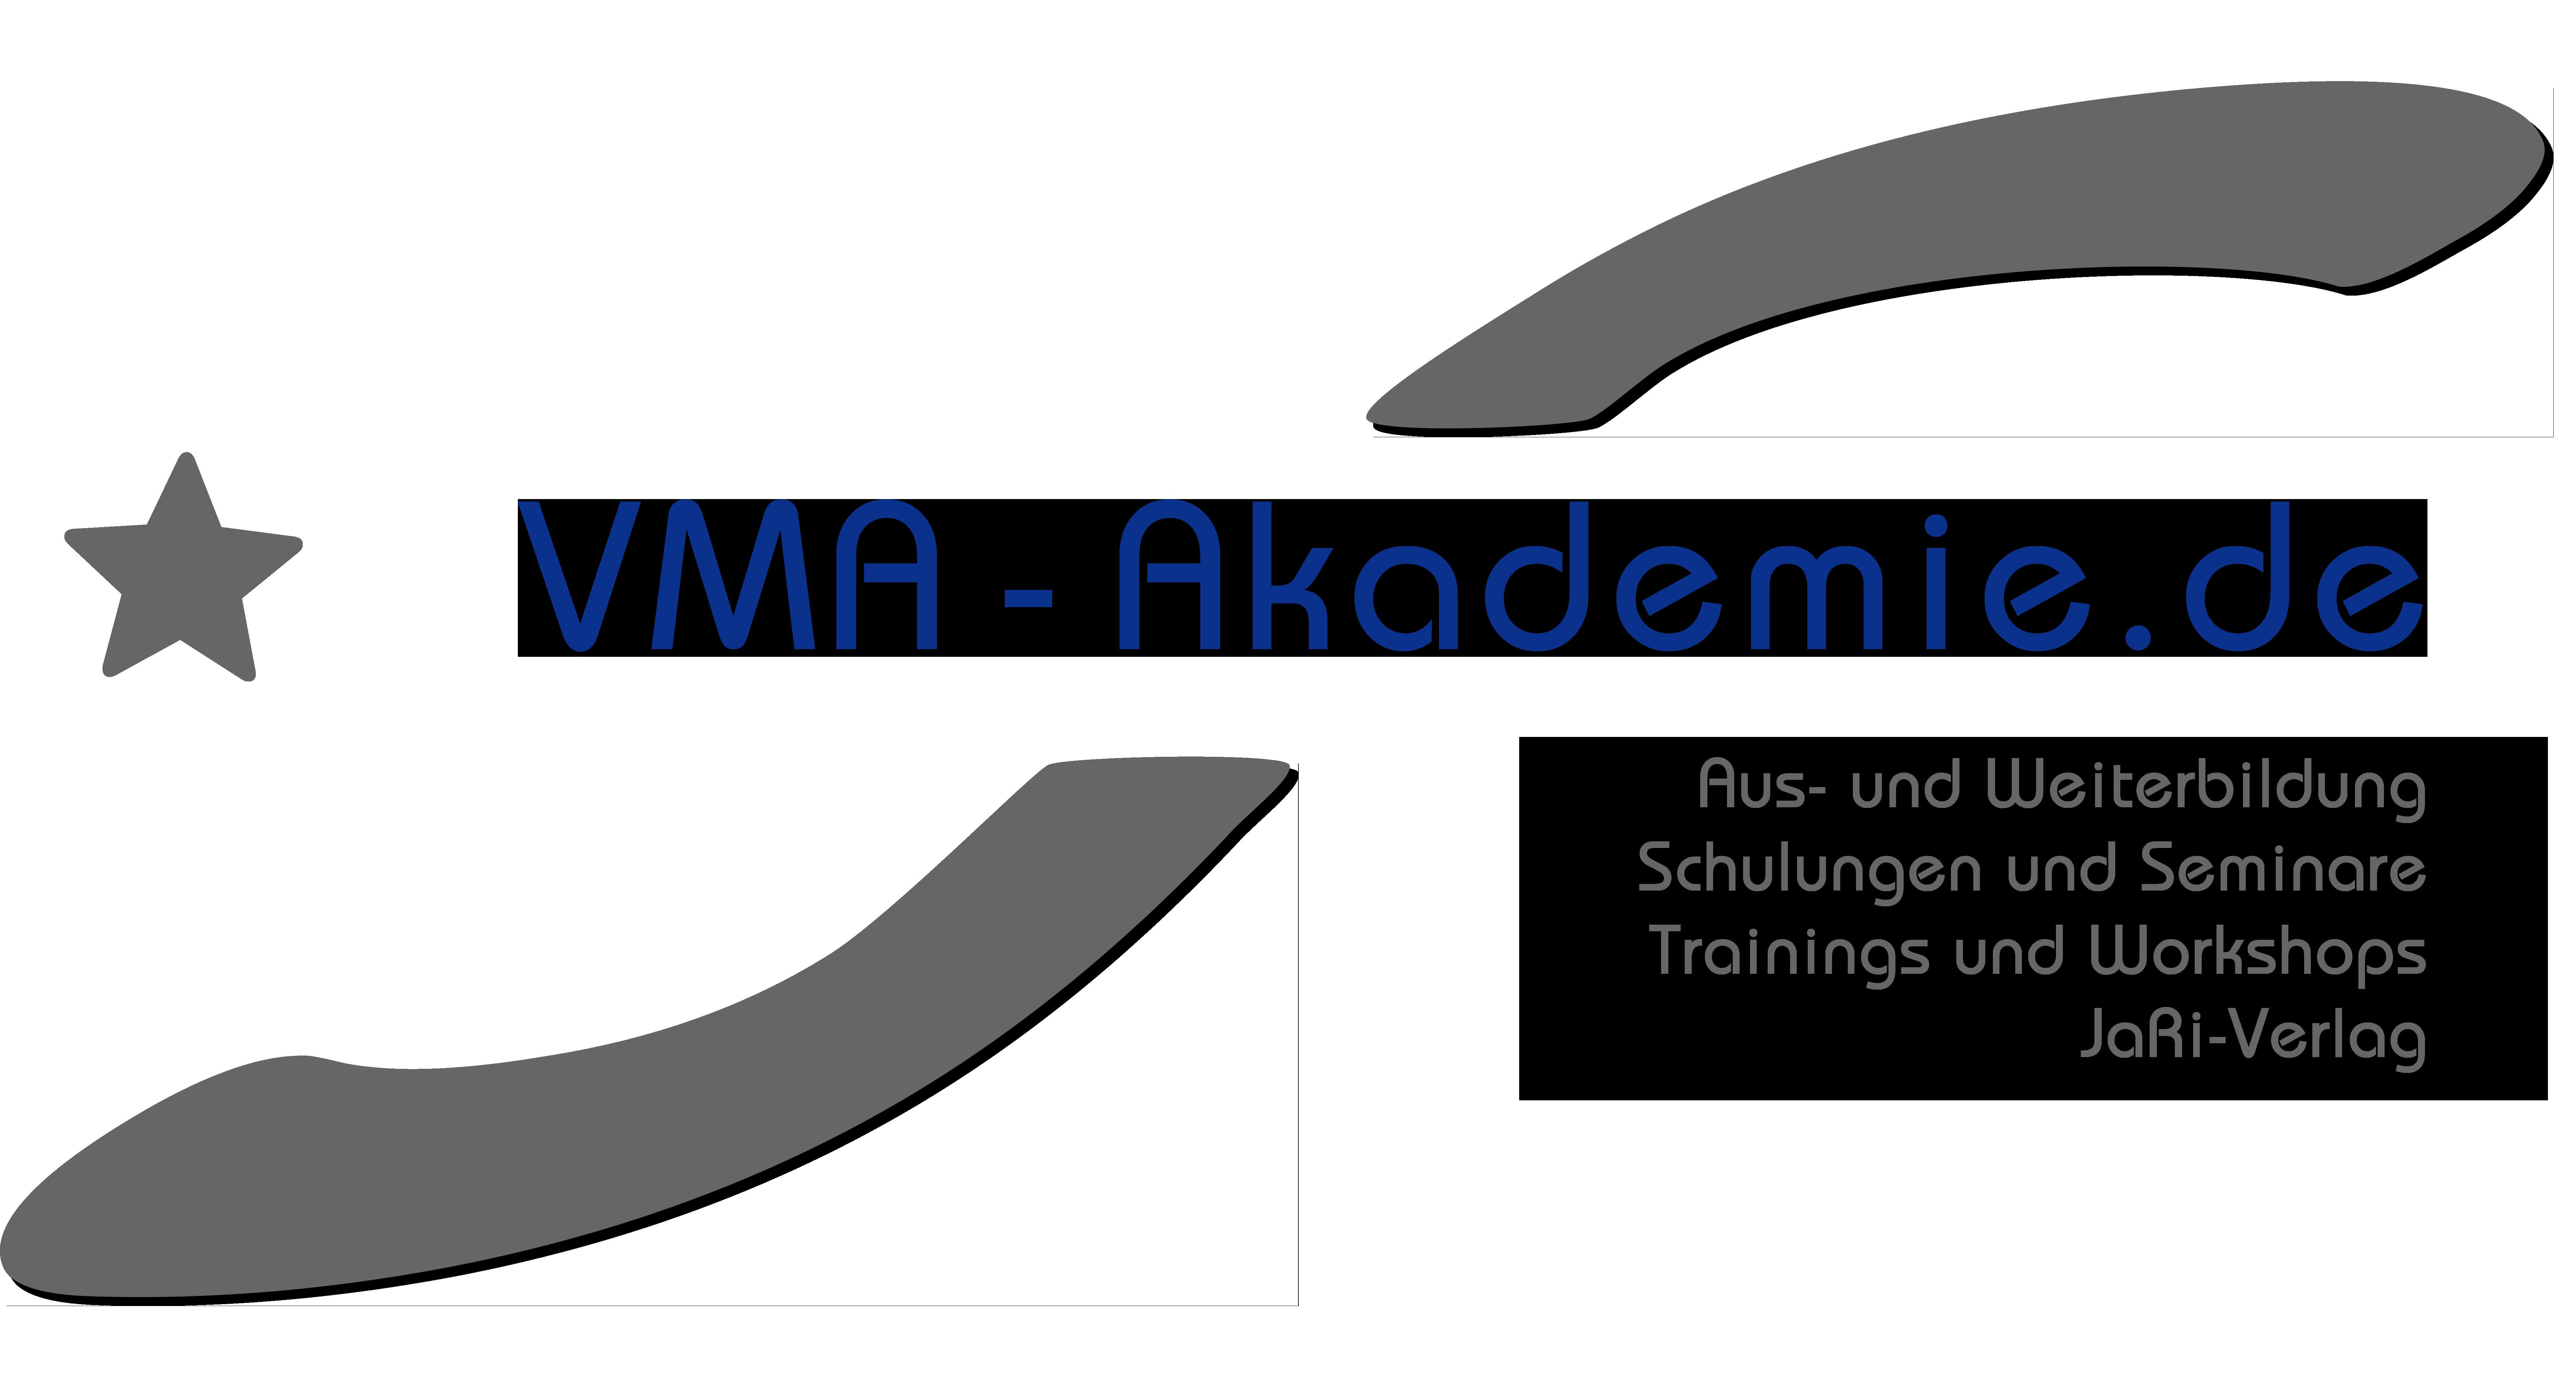 VMA-Akademie